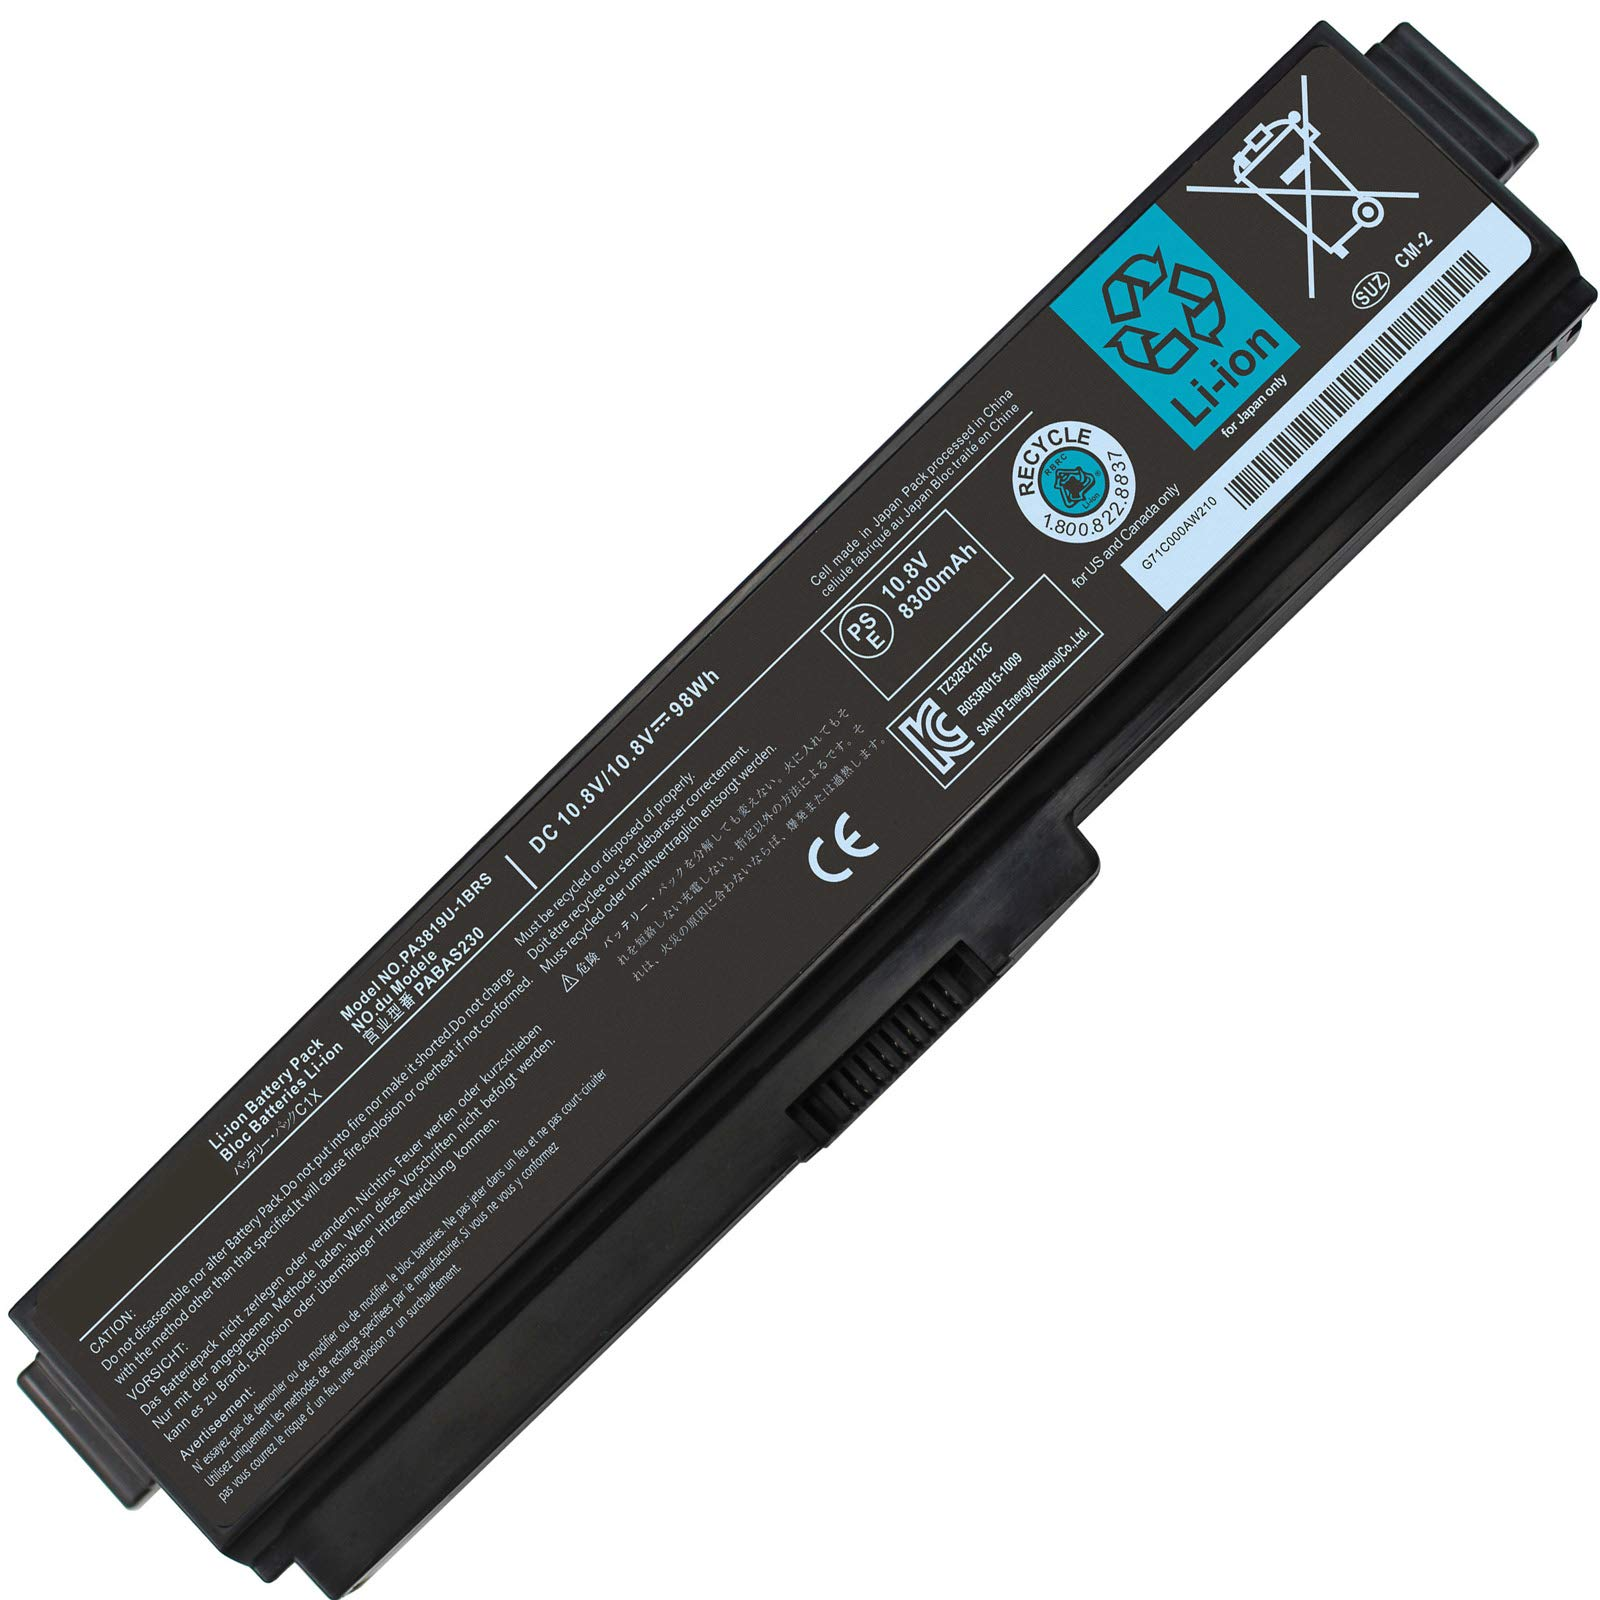 Bateria DOMALLK 12 Celdas PA3819U-1BRS PA3817U-1BRS Toshiba